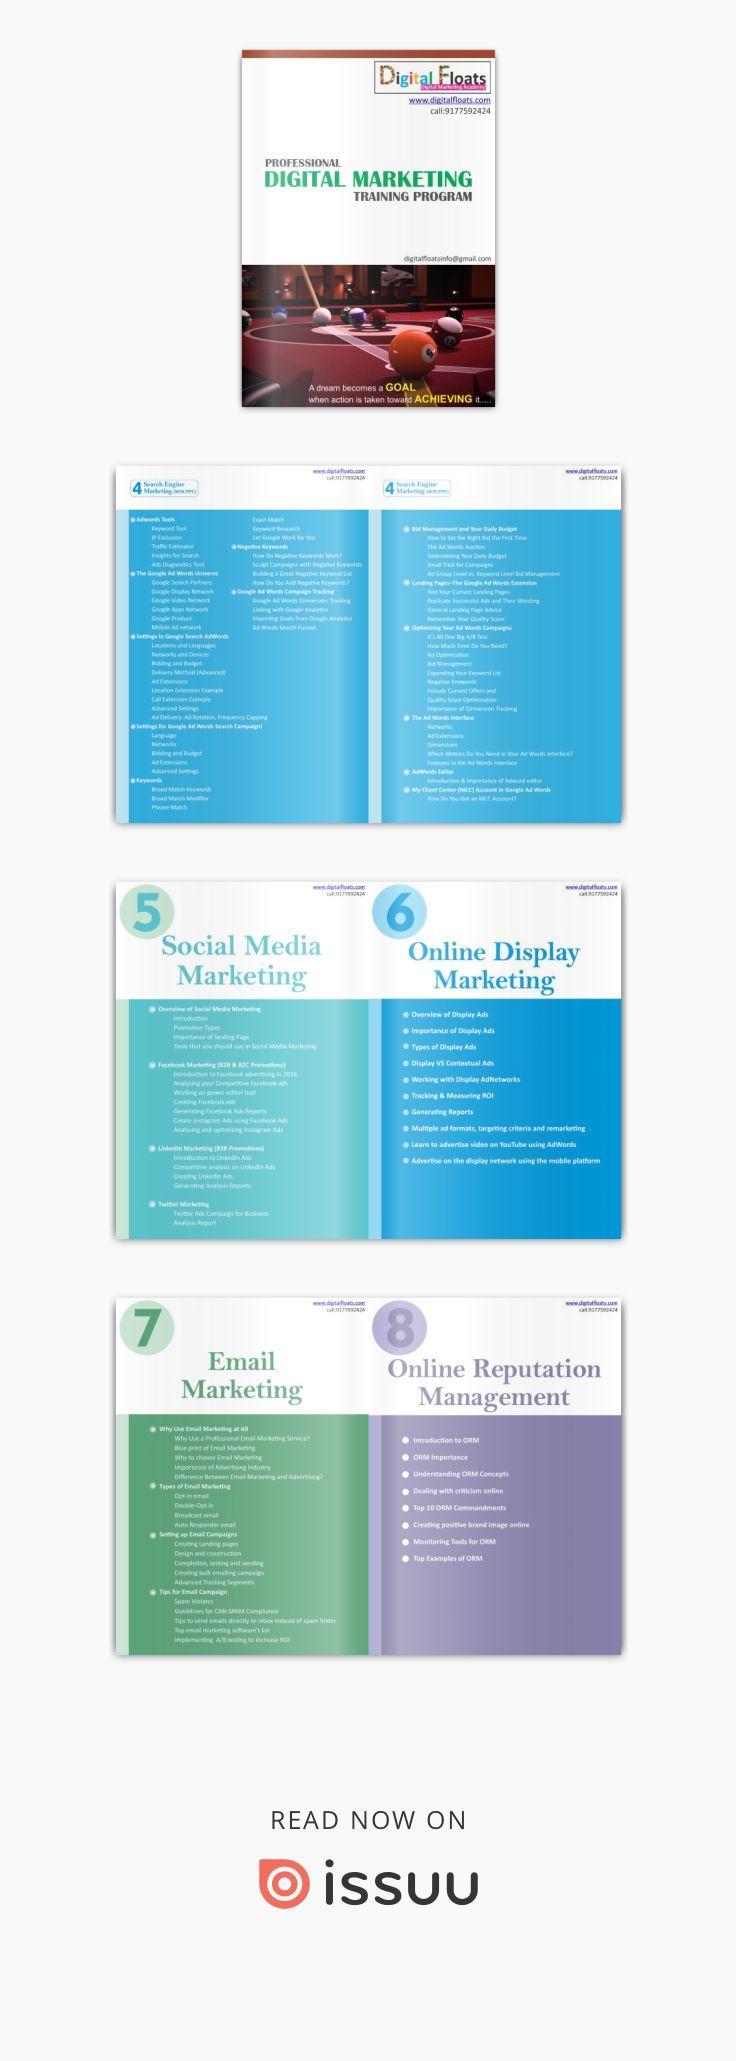 Digital Marketing Course in Hyderabad Digital marketing